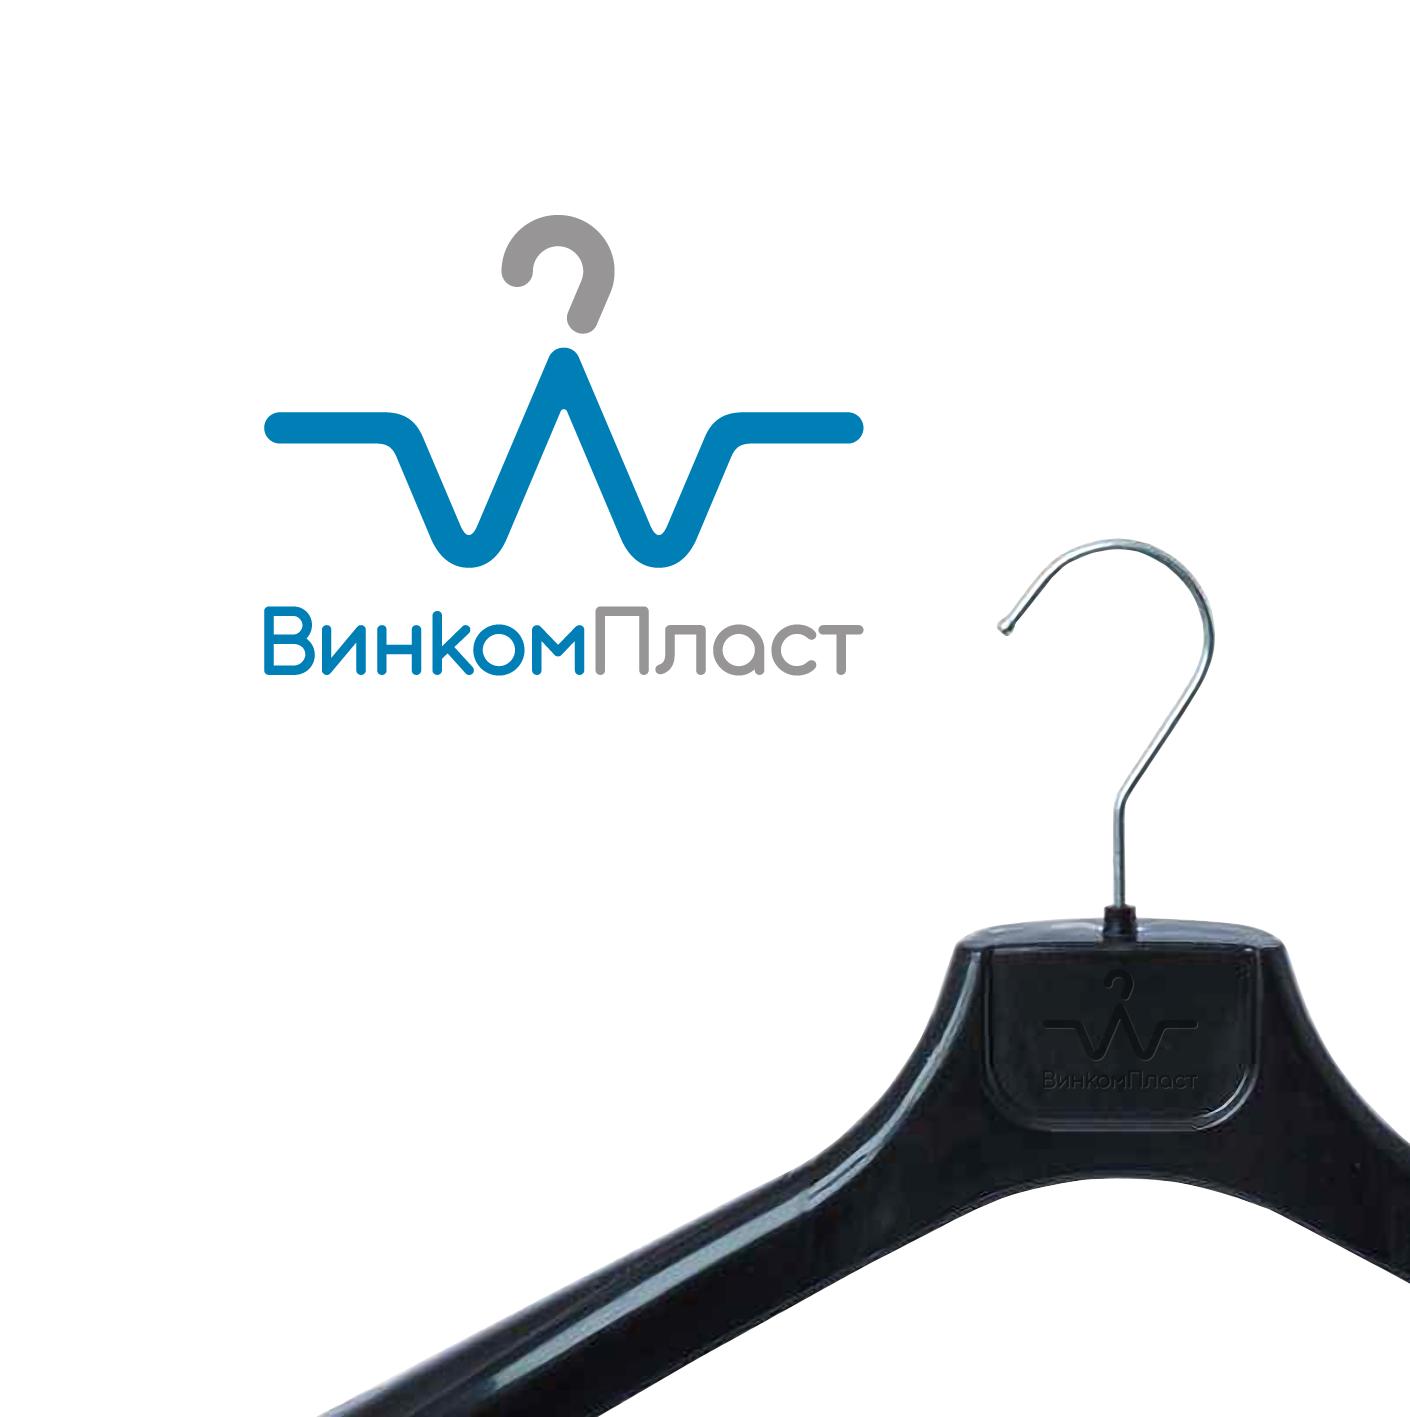 Логотип, фавикон и визитка для компании Винком Пласт  фото f_4315c38c7eed0a15.png